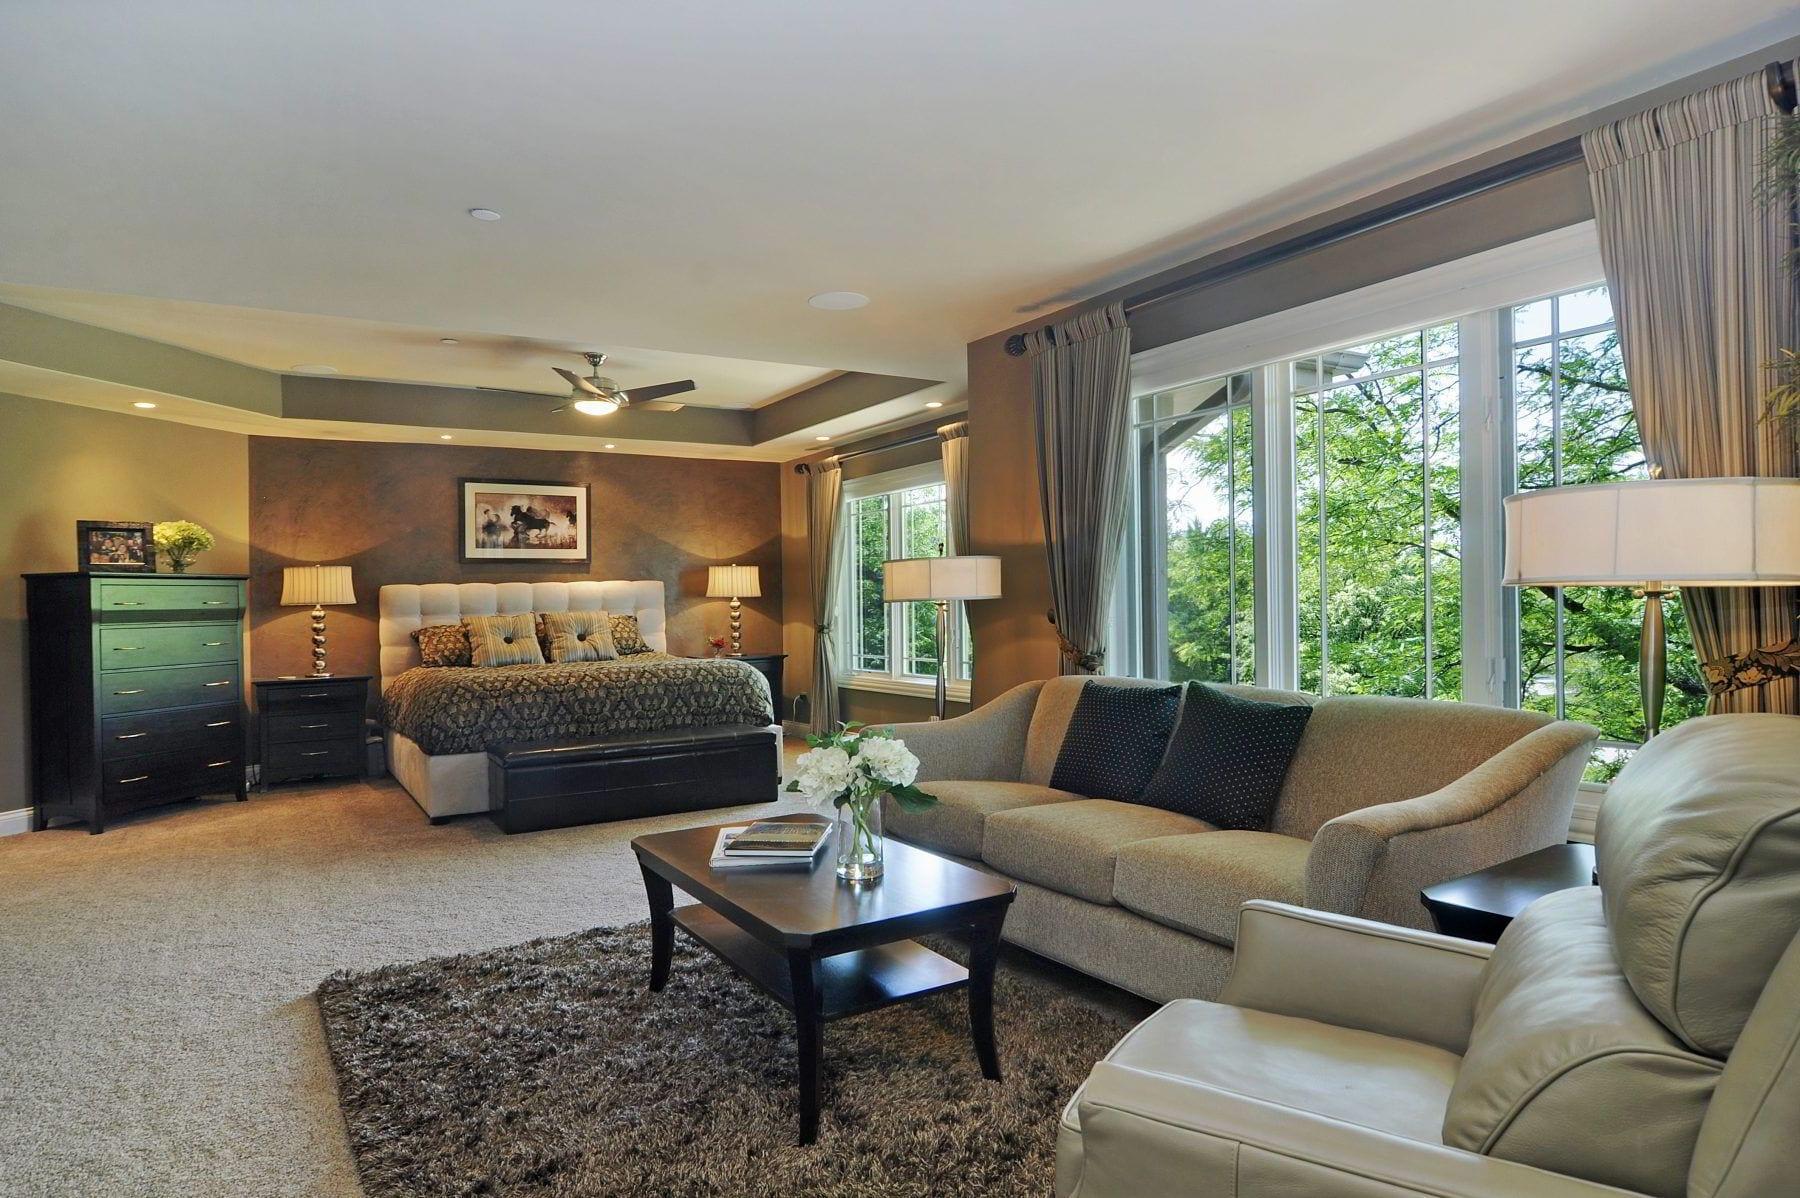 design of home furniture. prevnext design of home furniture n